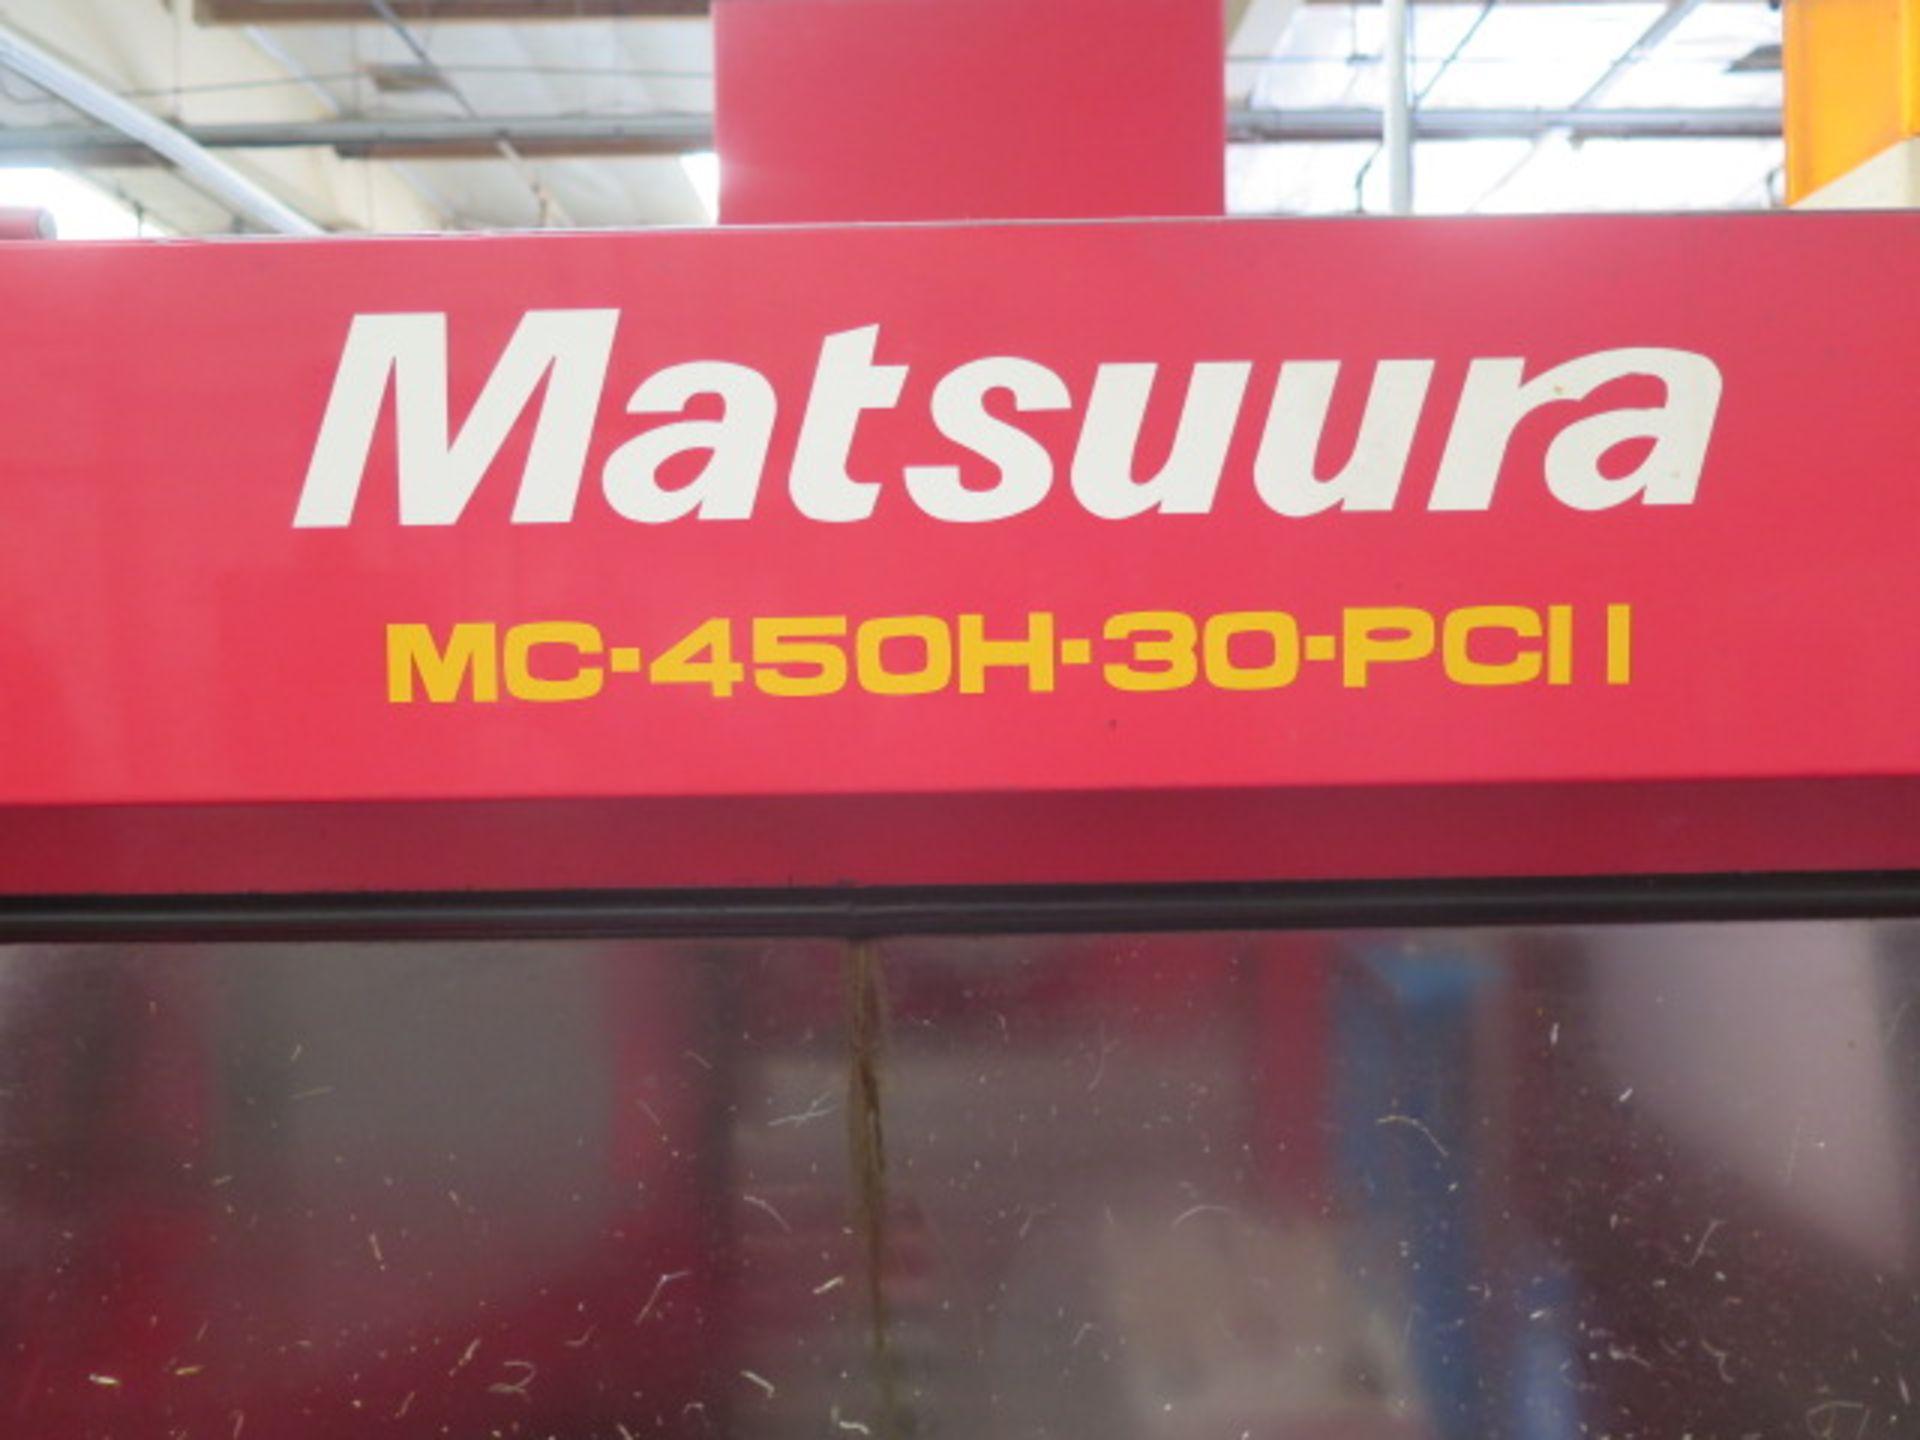 1992 Matsuura MC-450H-30-PC II 10-Pallet CNC Horizontal Machining Center s/n 910609609, SOLD AS IS - Image 3 of 23